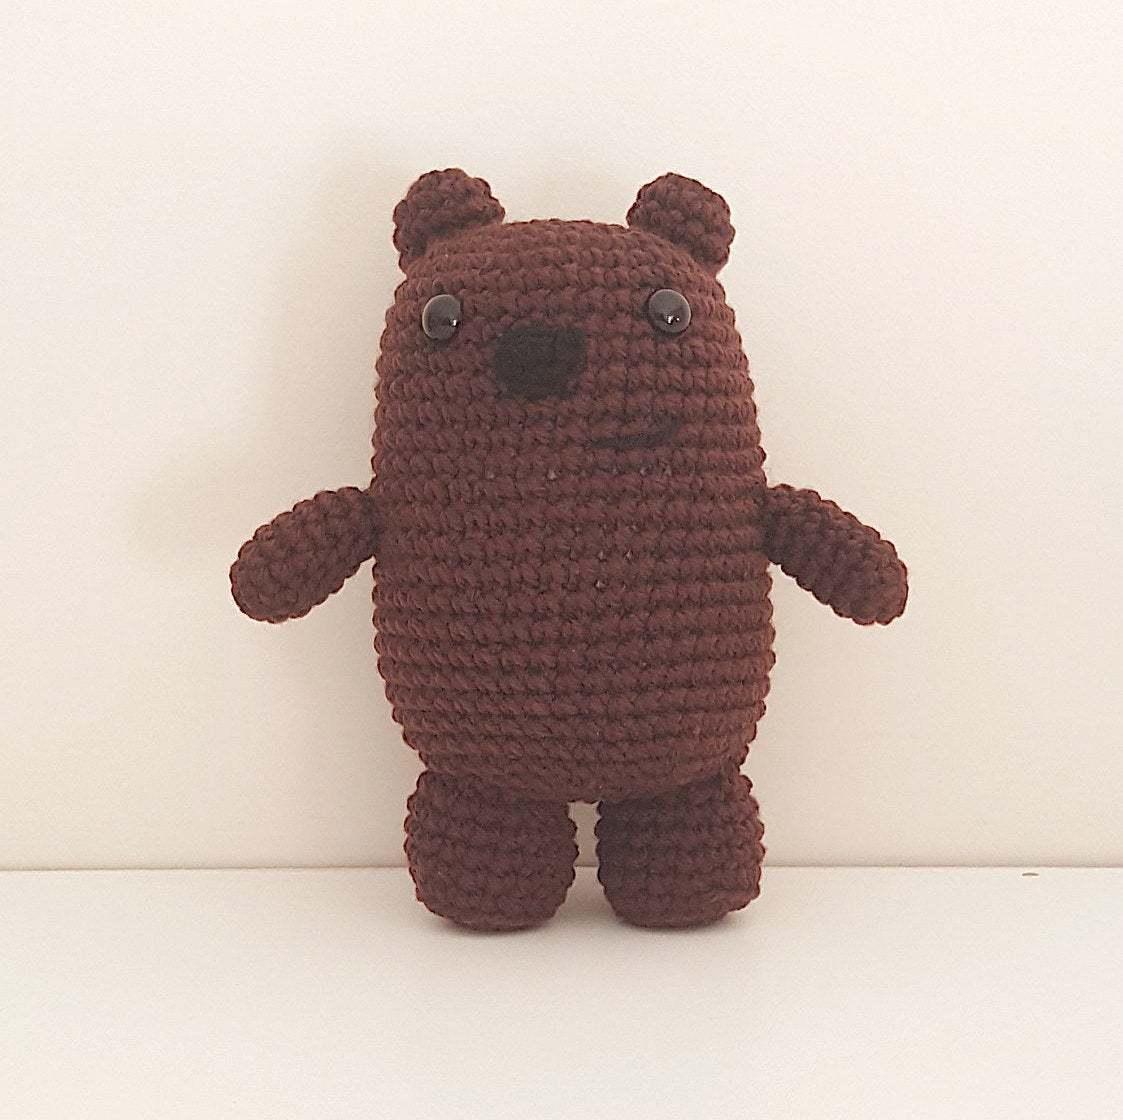 CROCHET PATTERN: We Bare Bears Inspired Bear Stack small | Etsy | 1120x1123